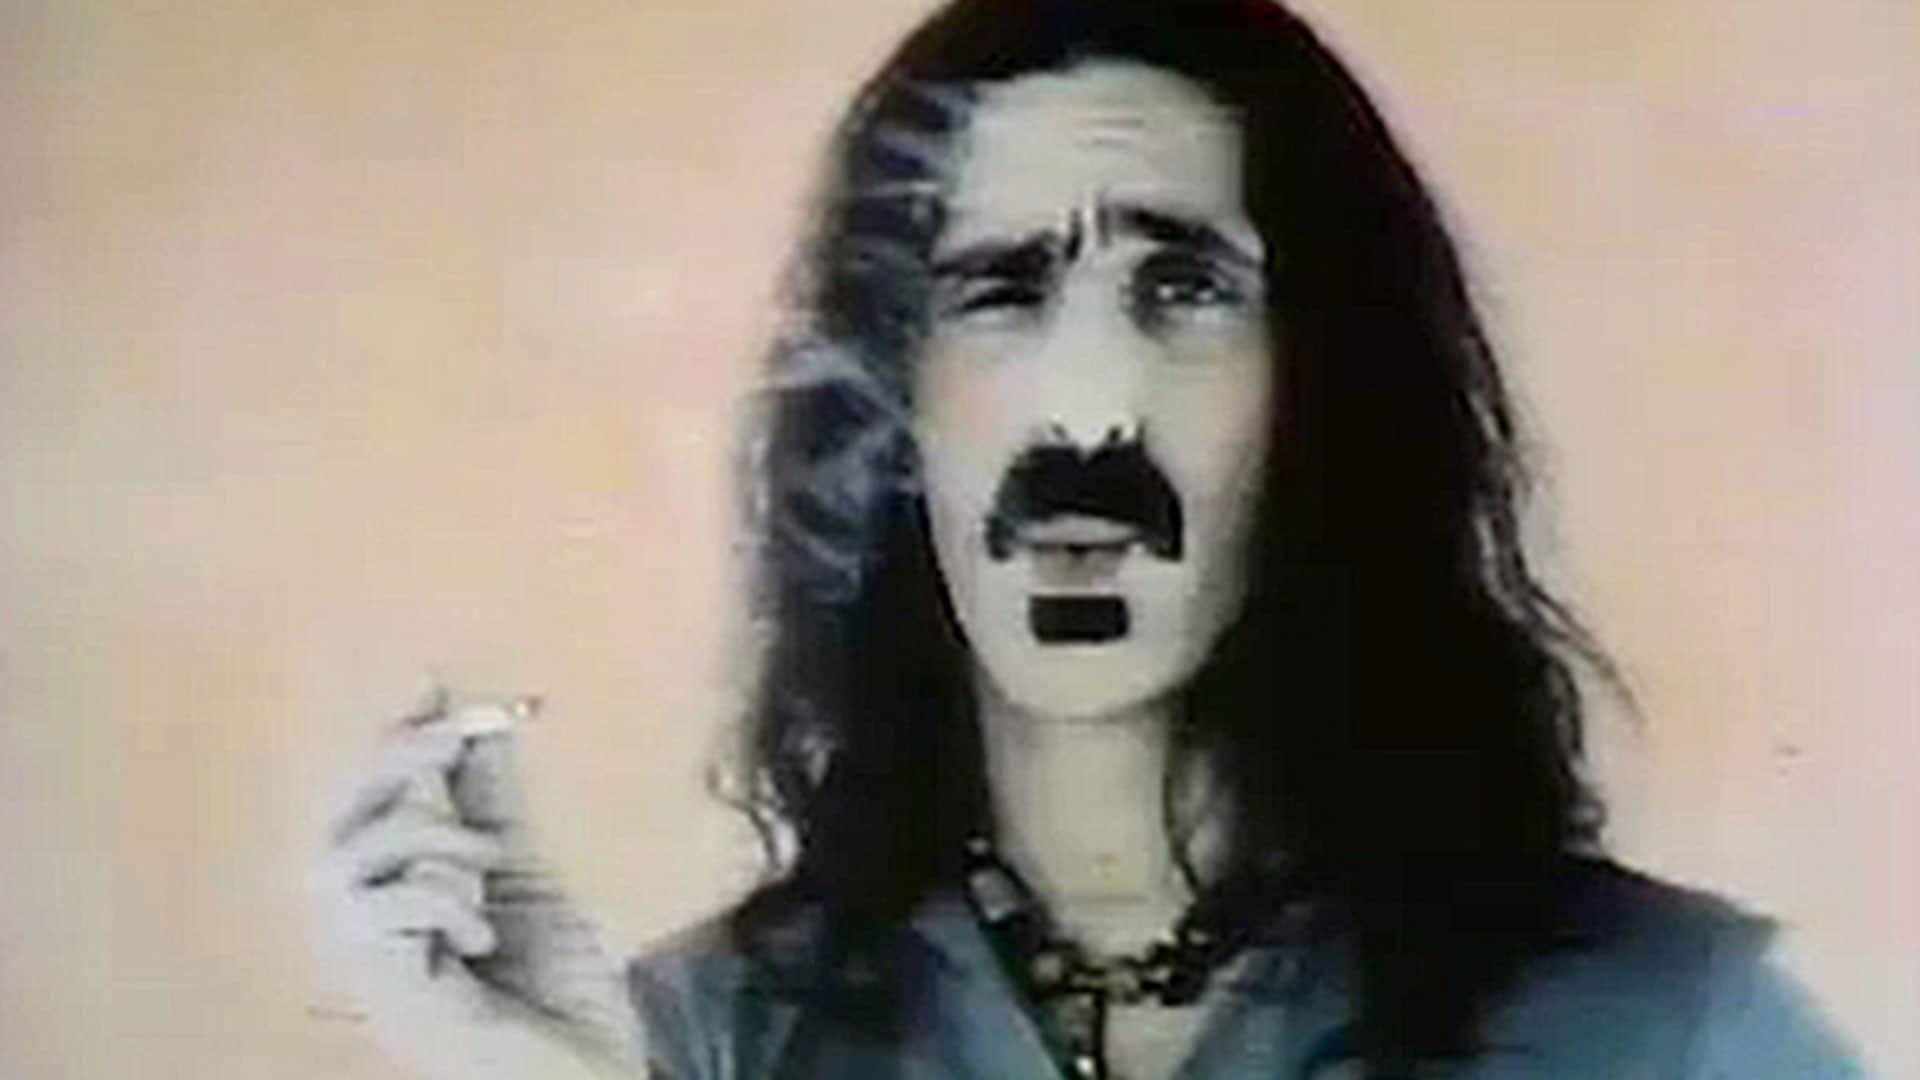 Frank Zappa: October 21,1978